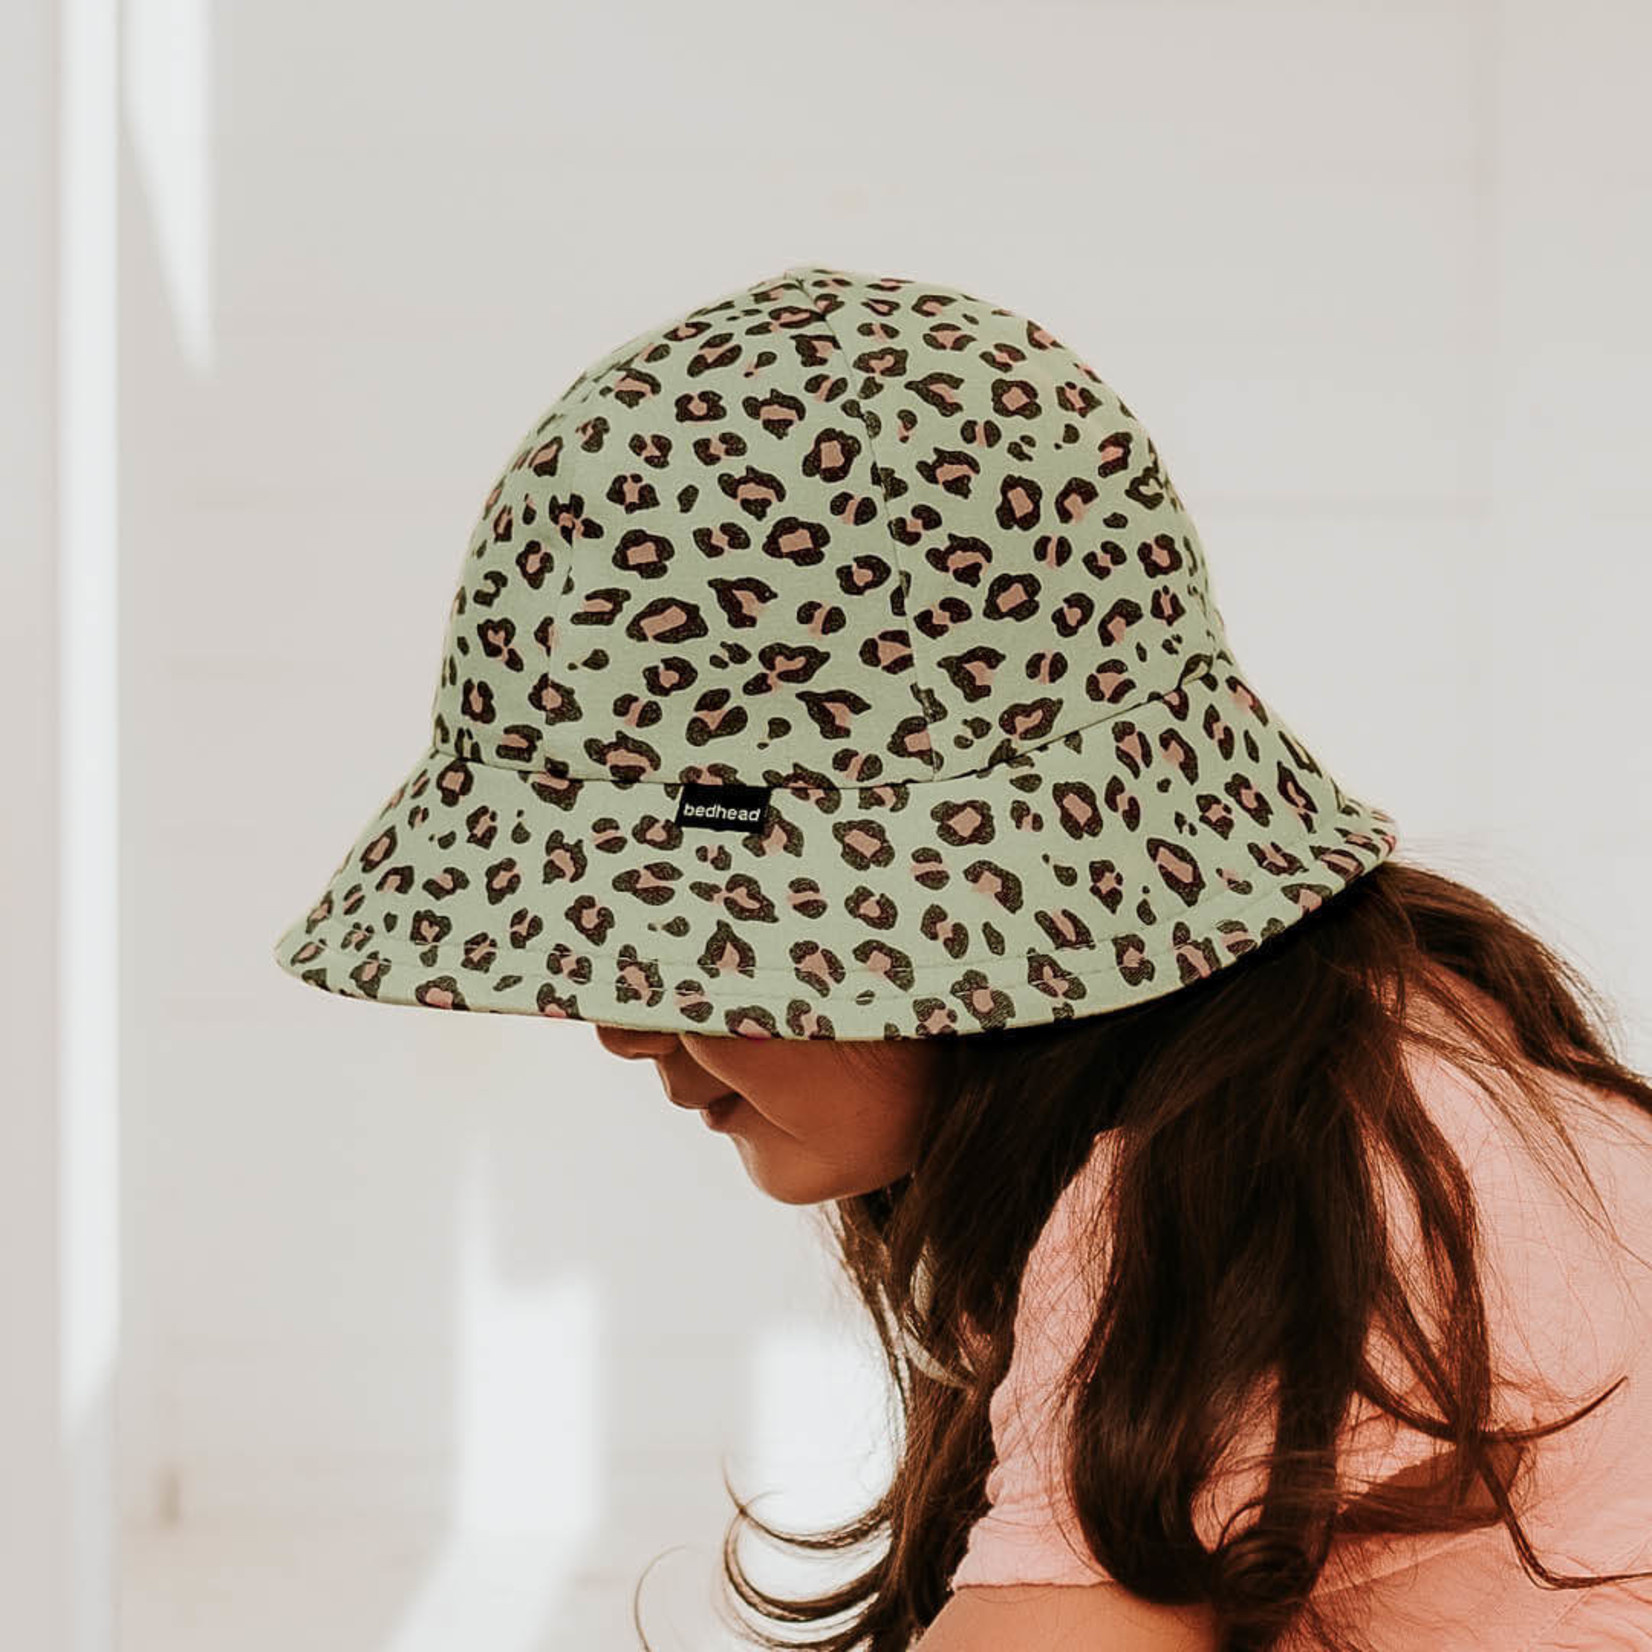 Bedhead Hats Bedhead Toddler Bucket Hat - Leopard